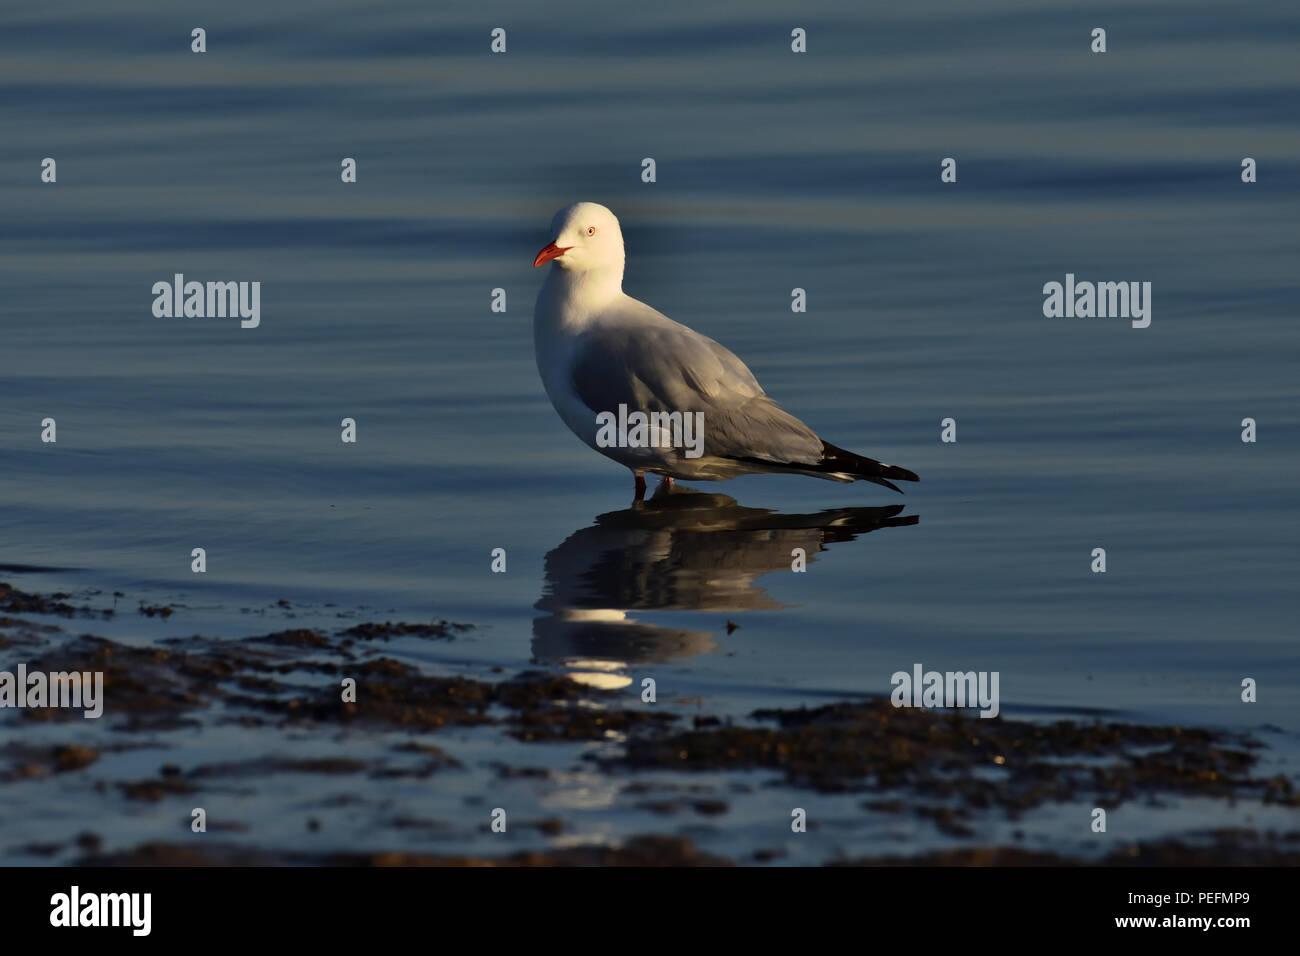 An Australian, Queensland Adult Silver Gull ( Larus novaehollandiae ) standing in low tide - Stock Image